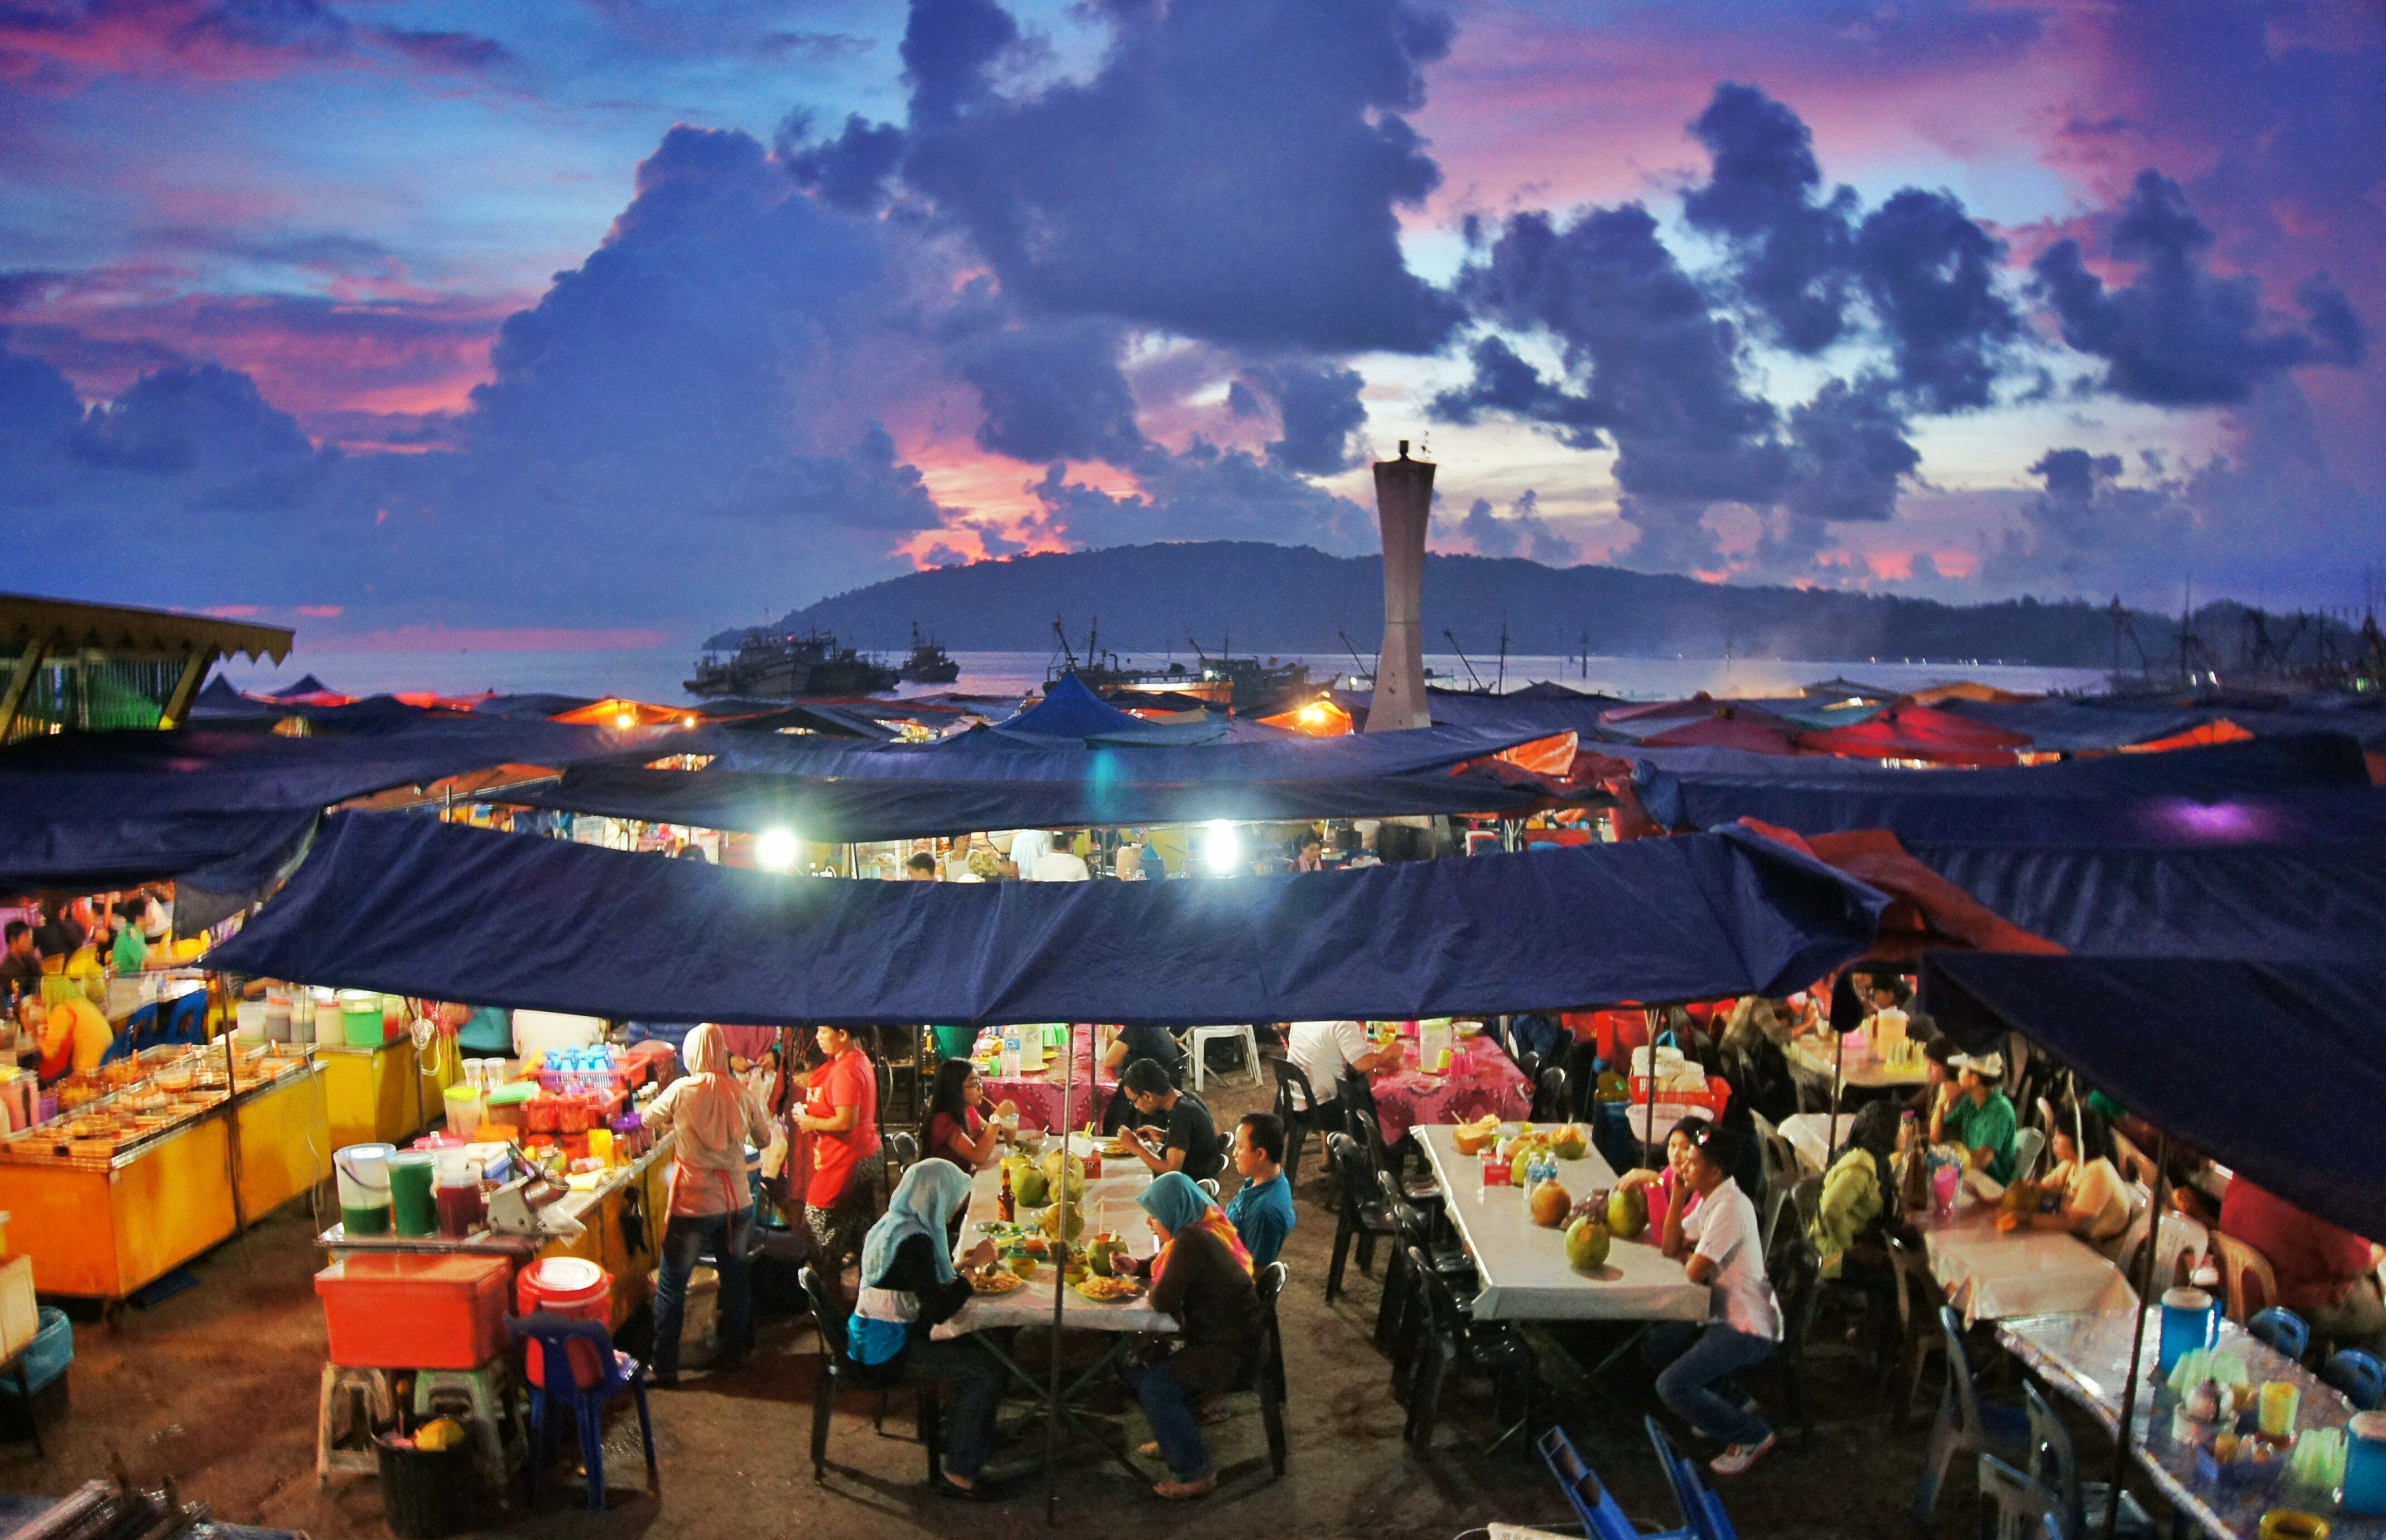 Kota Kinabalu Night Markets, Borneo, Malaysia